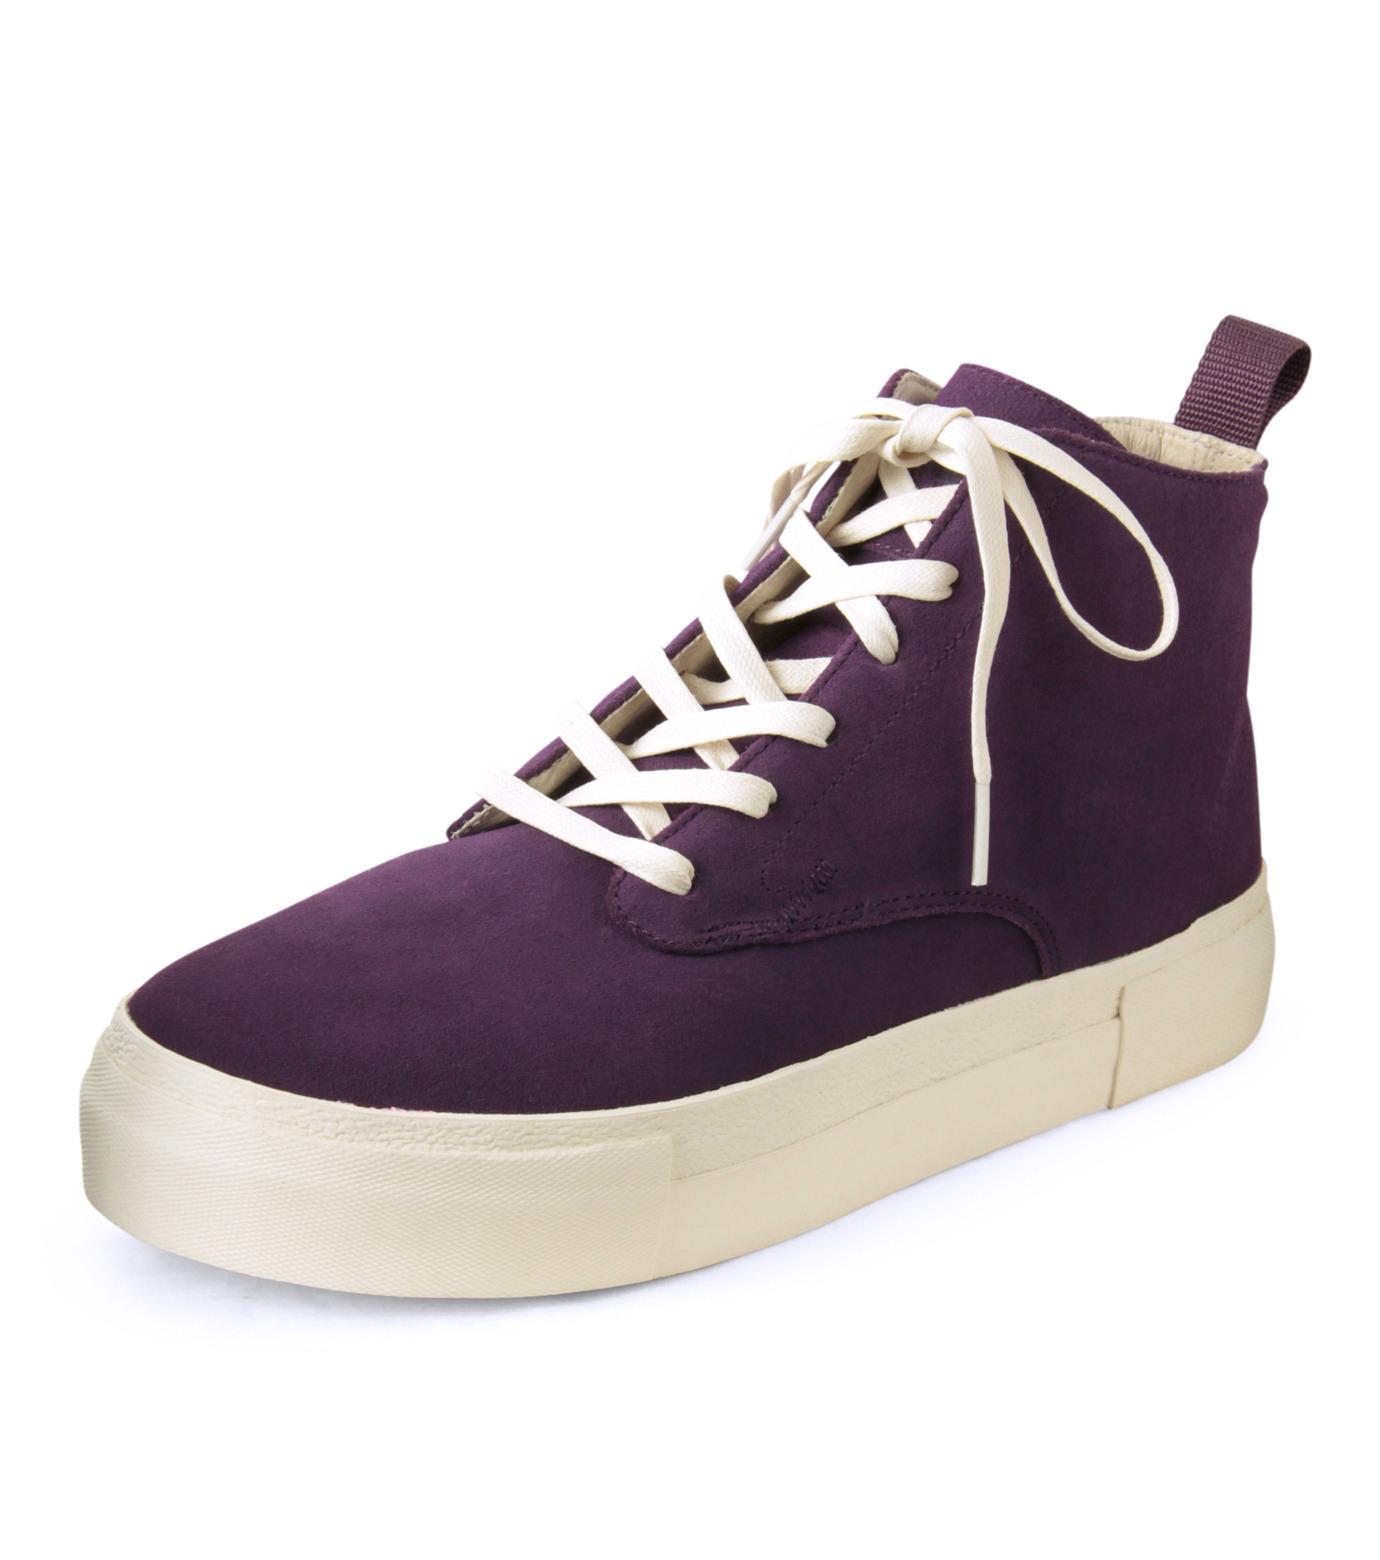 Eytys(エイティーズ)のSuedeHicutSneaker-PURPLE(スニーカー/sneaker)-ODYSSEY-SUE-82 拡大詳細画像5